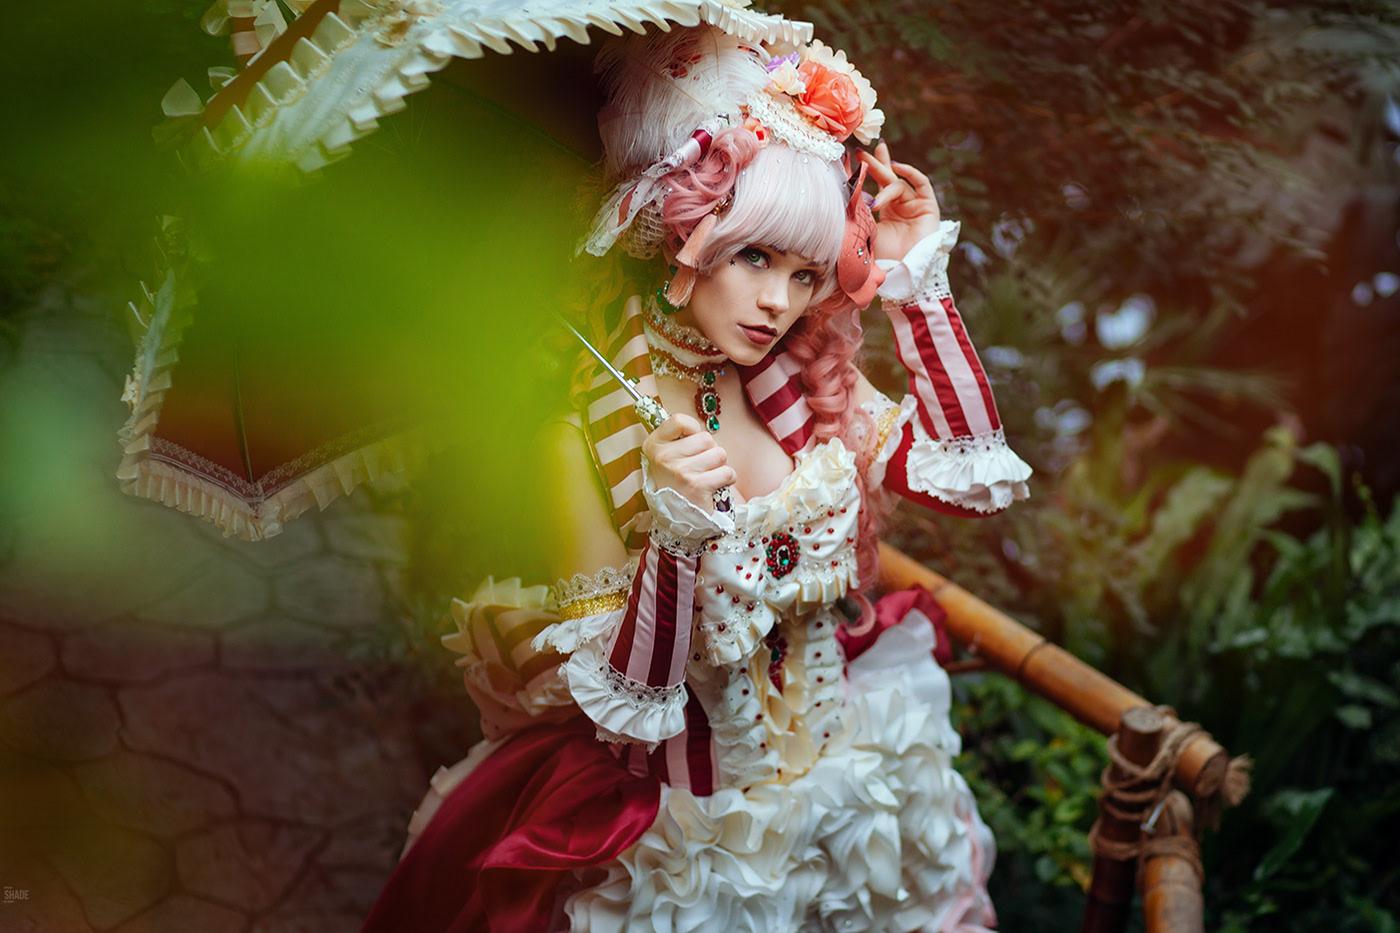 Cheshire Cat / фотограф Lina Aster